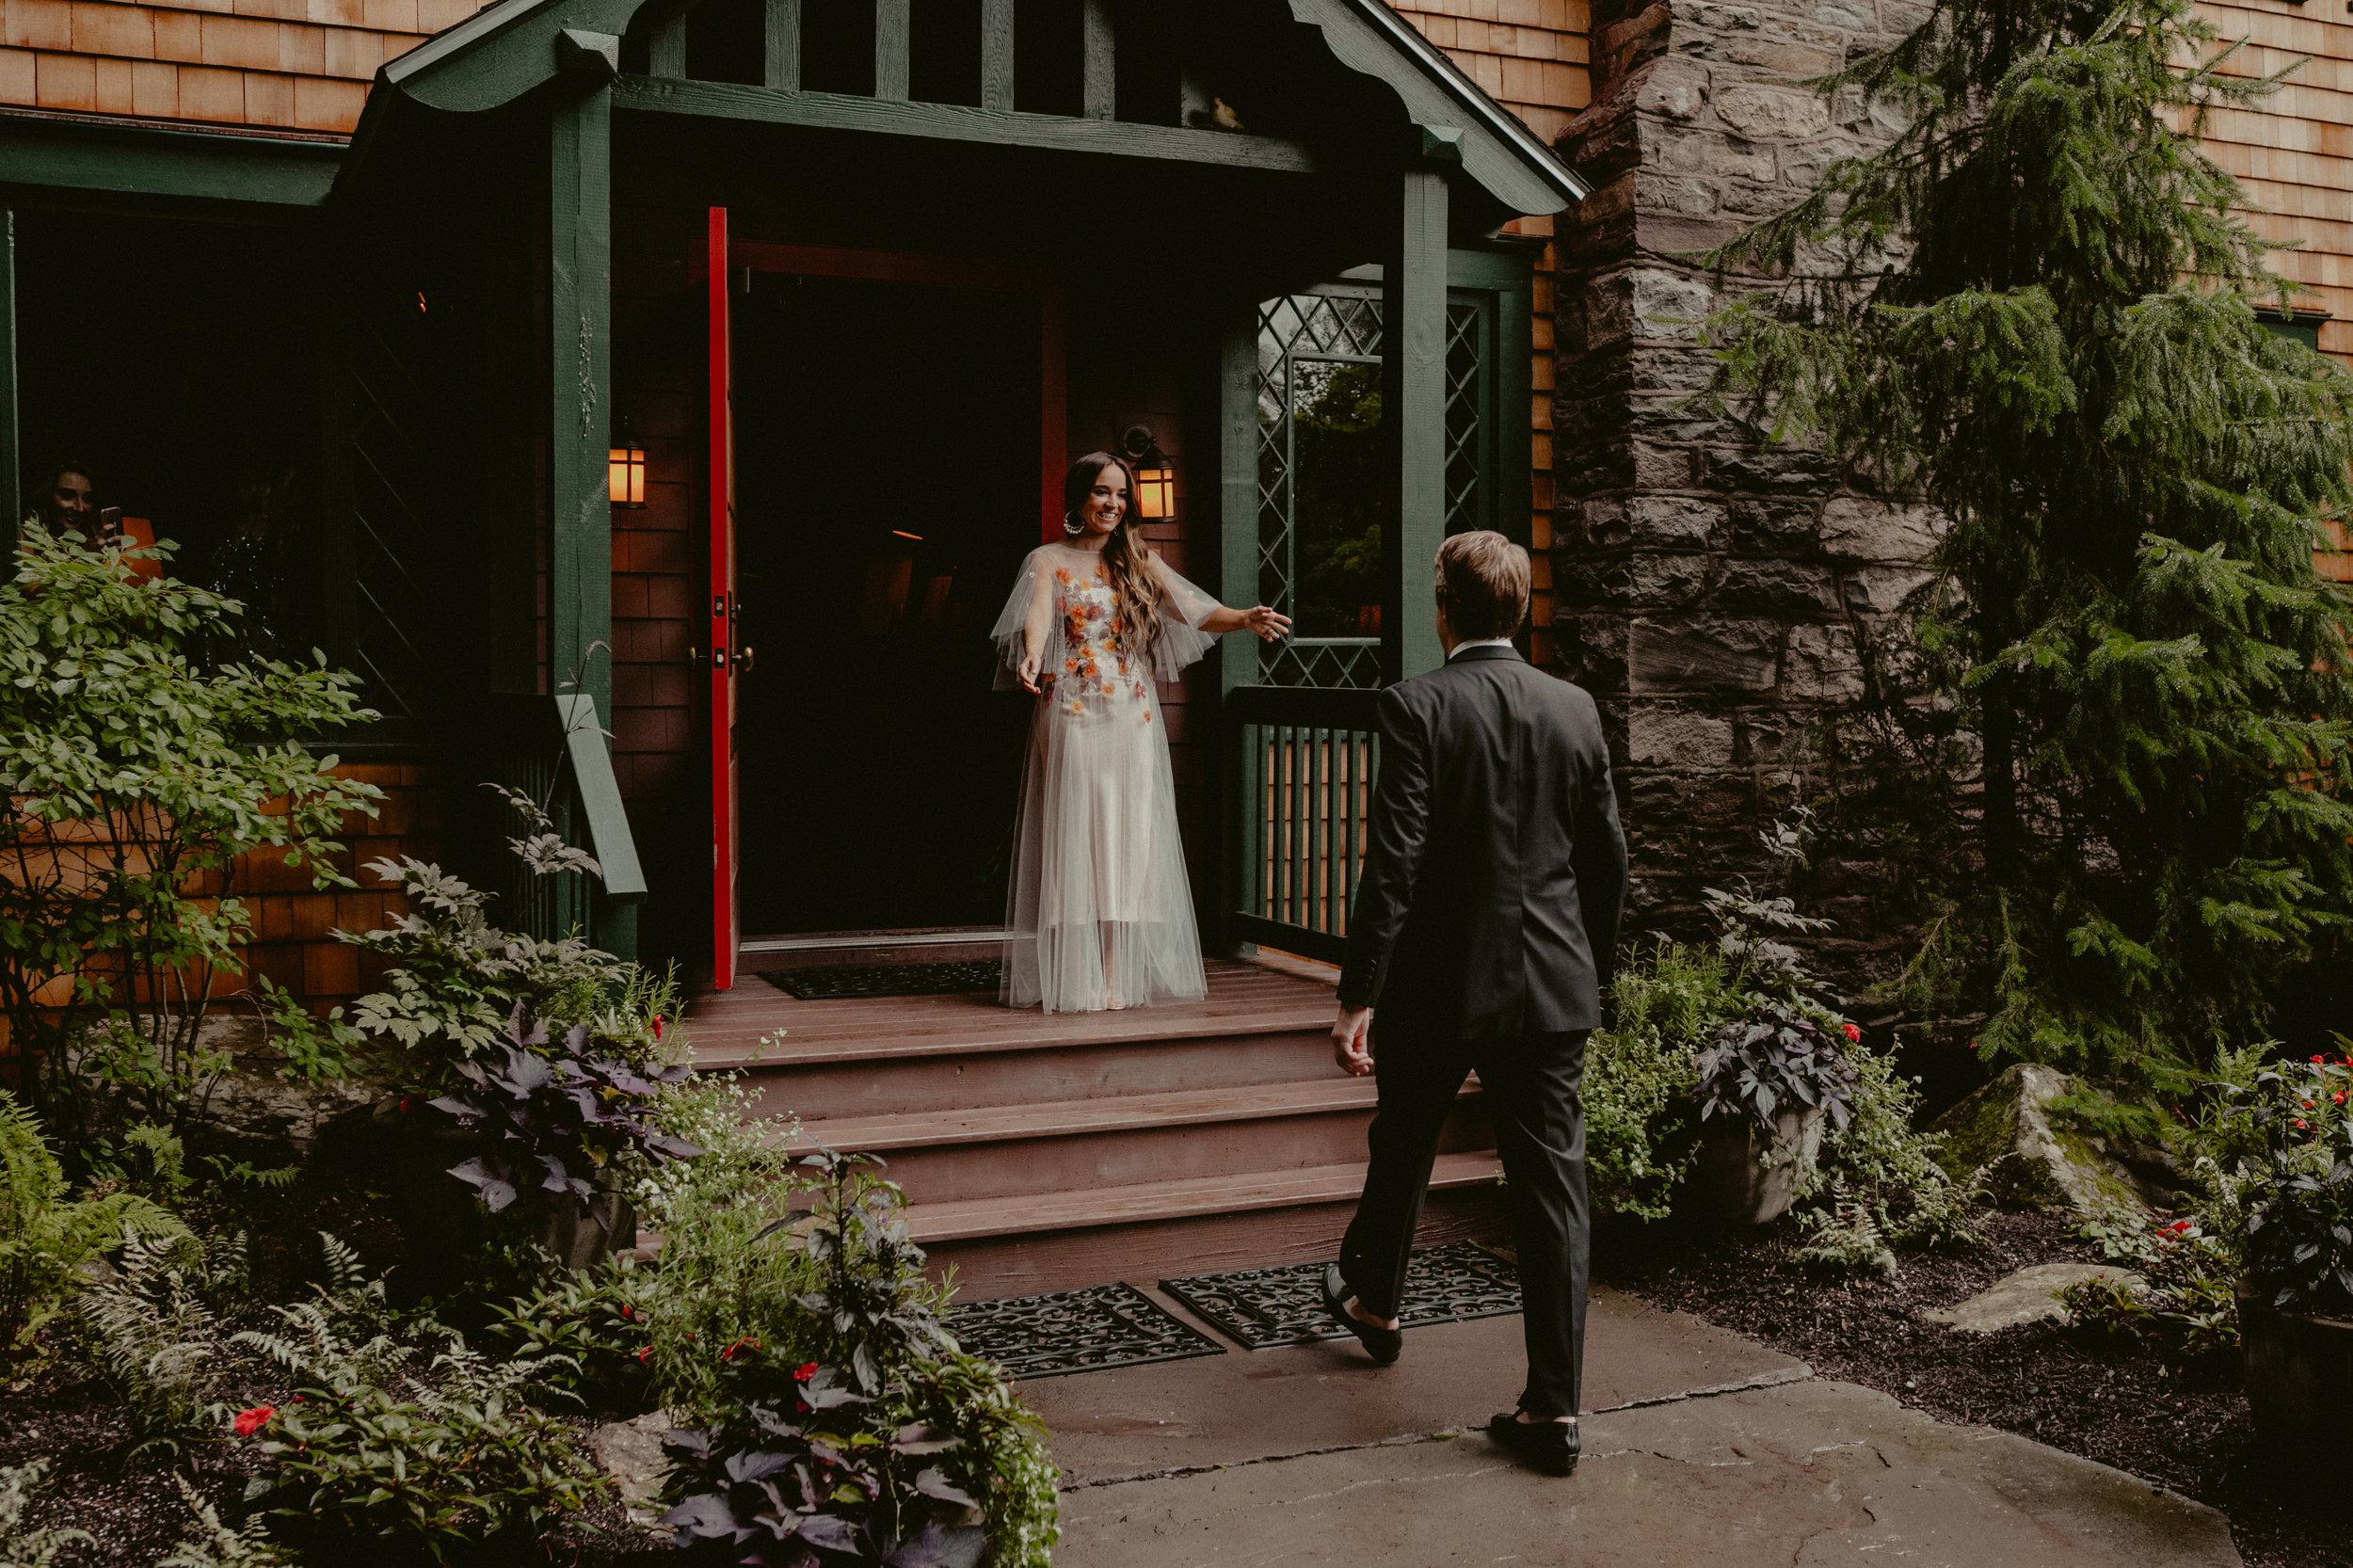 DEER_MOUNTAIN_INN_WEDDING_CHELLISE_MICHAEL_PHOTOGRAPHY-1136.jpg